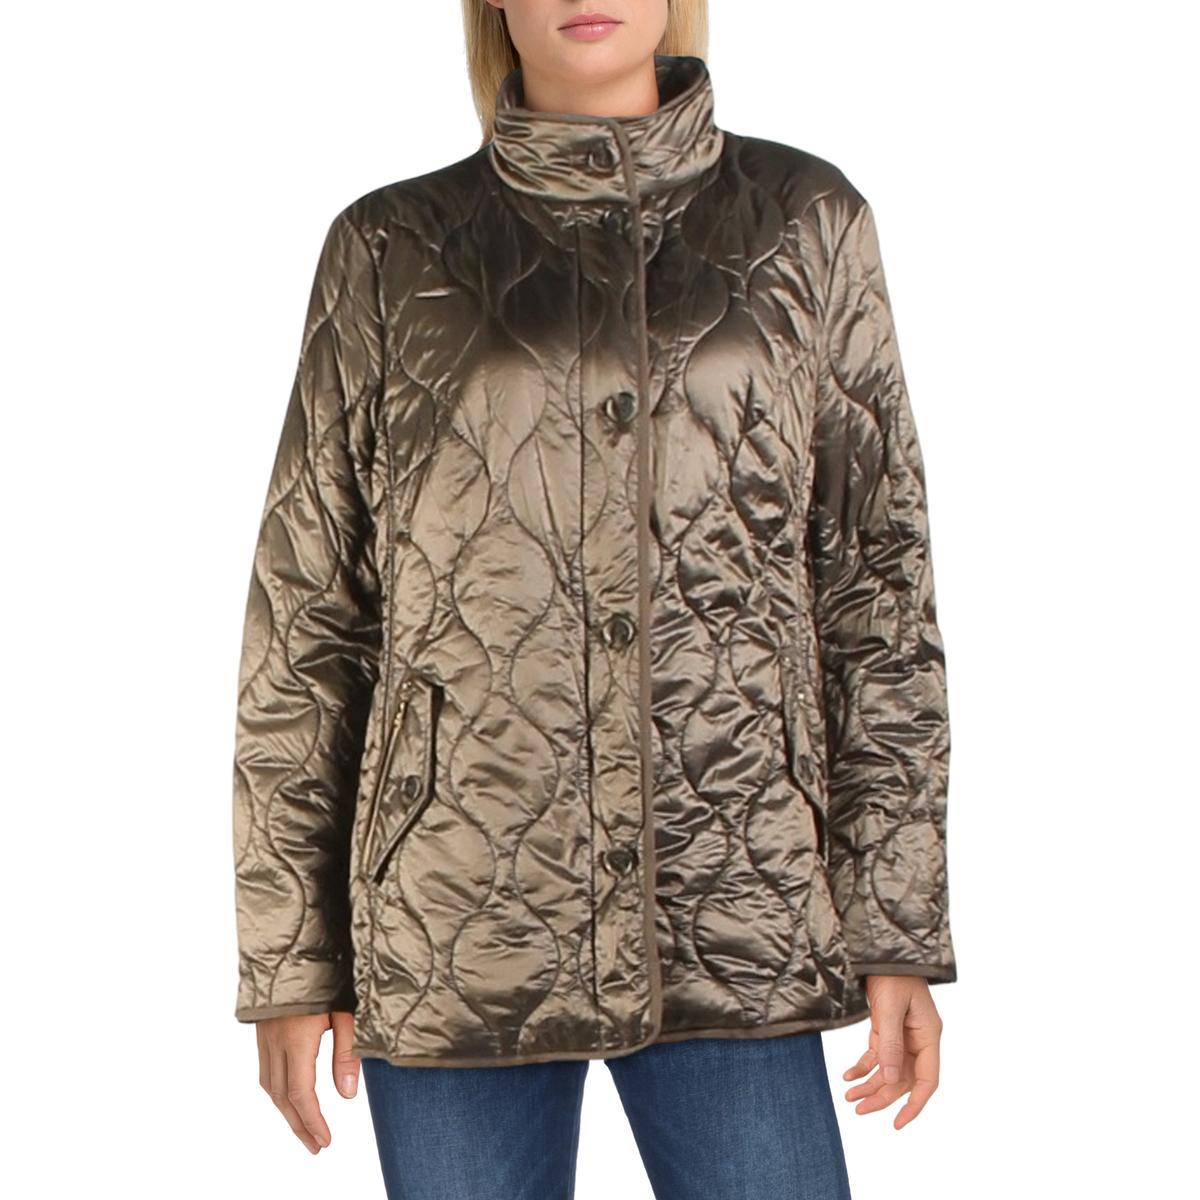 Basler Womens Quilted Lightweight Casual Jacket Coat BHFO 7530   eBay